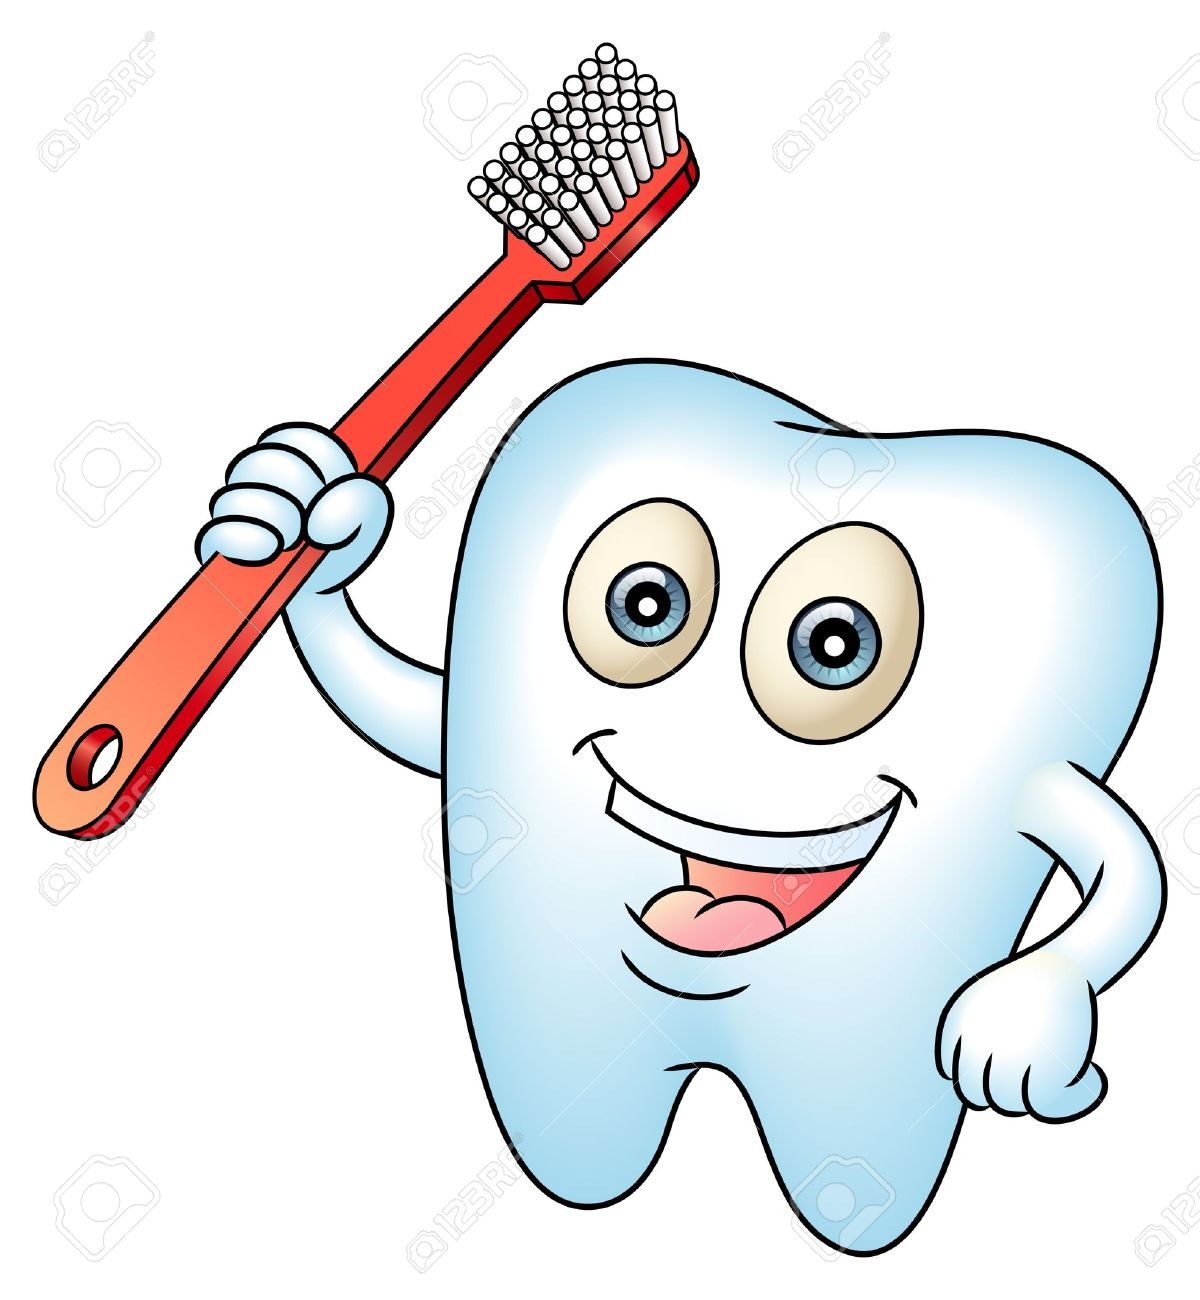 ABL Dental Clinic